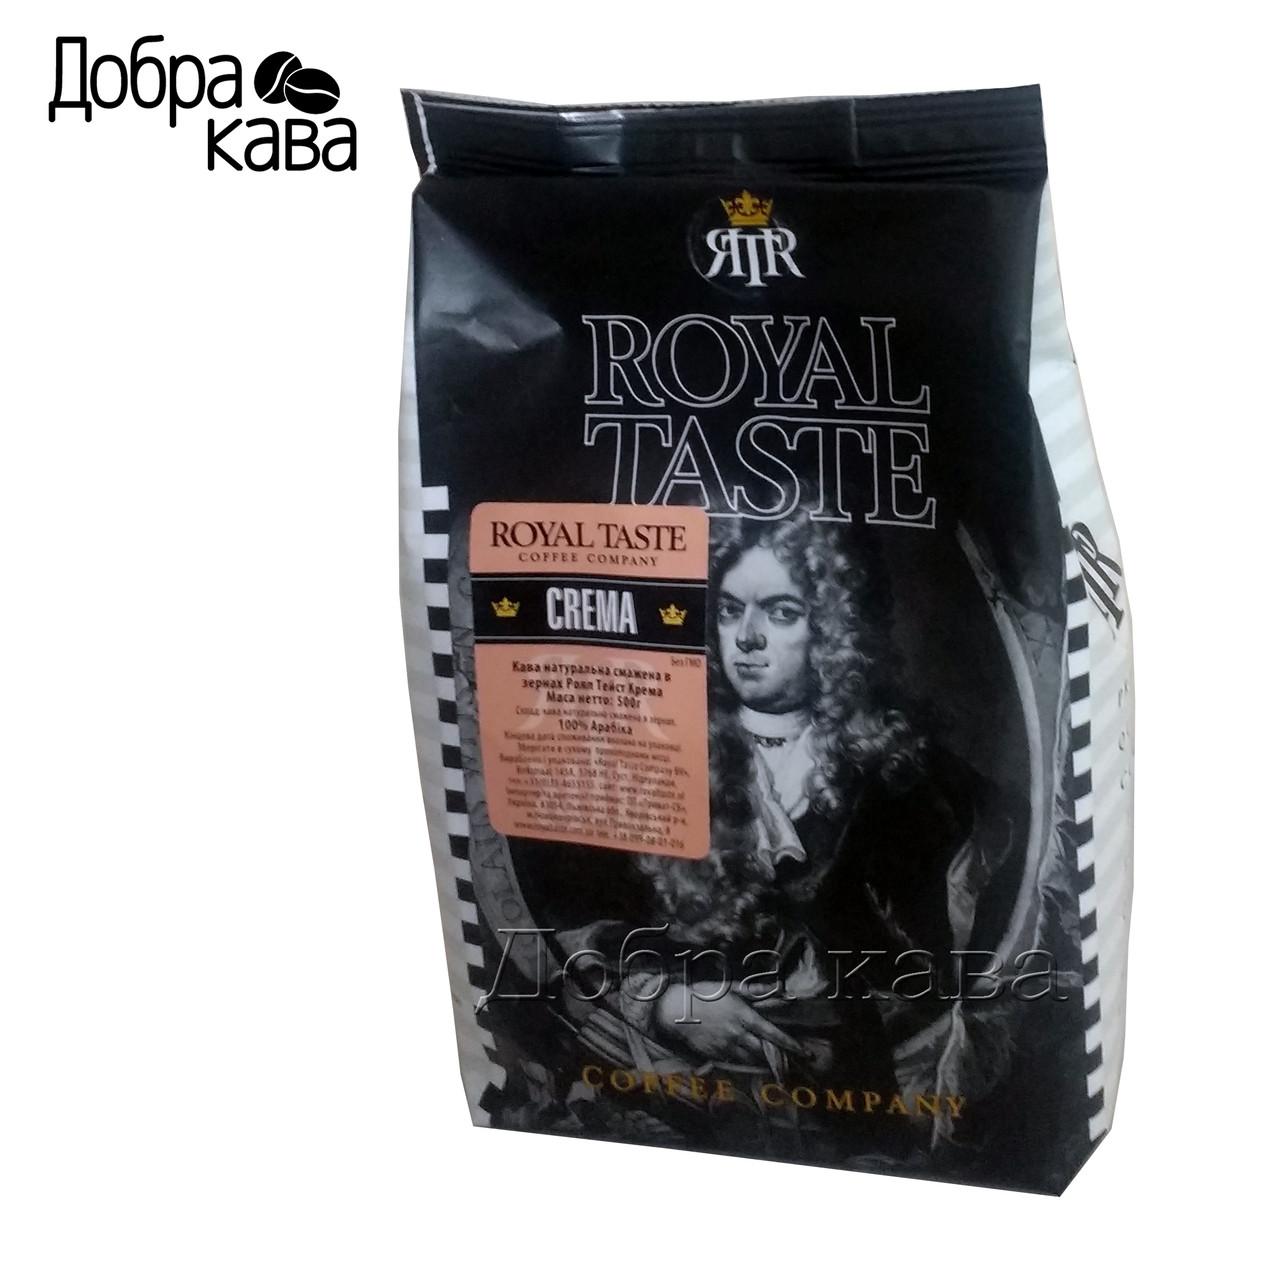 Royal Taste Crema (100% Арабика) кофе в зернах 500 г